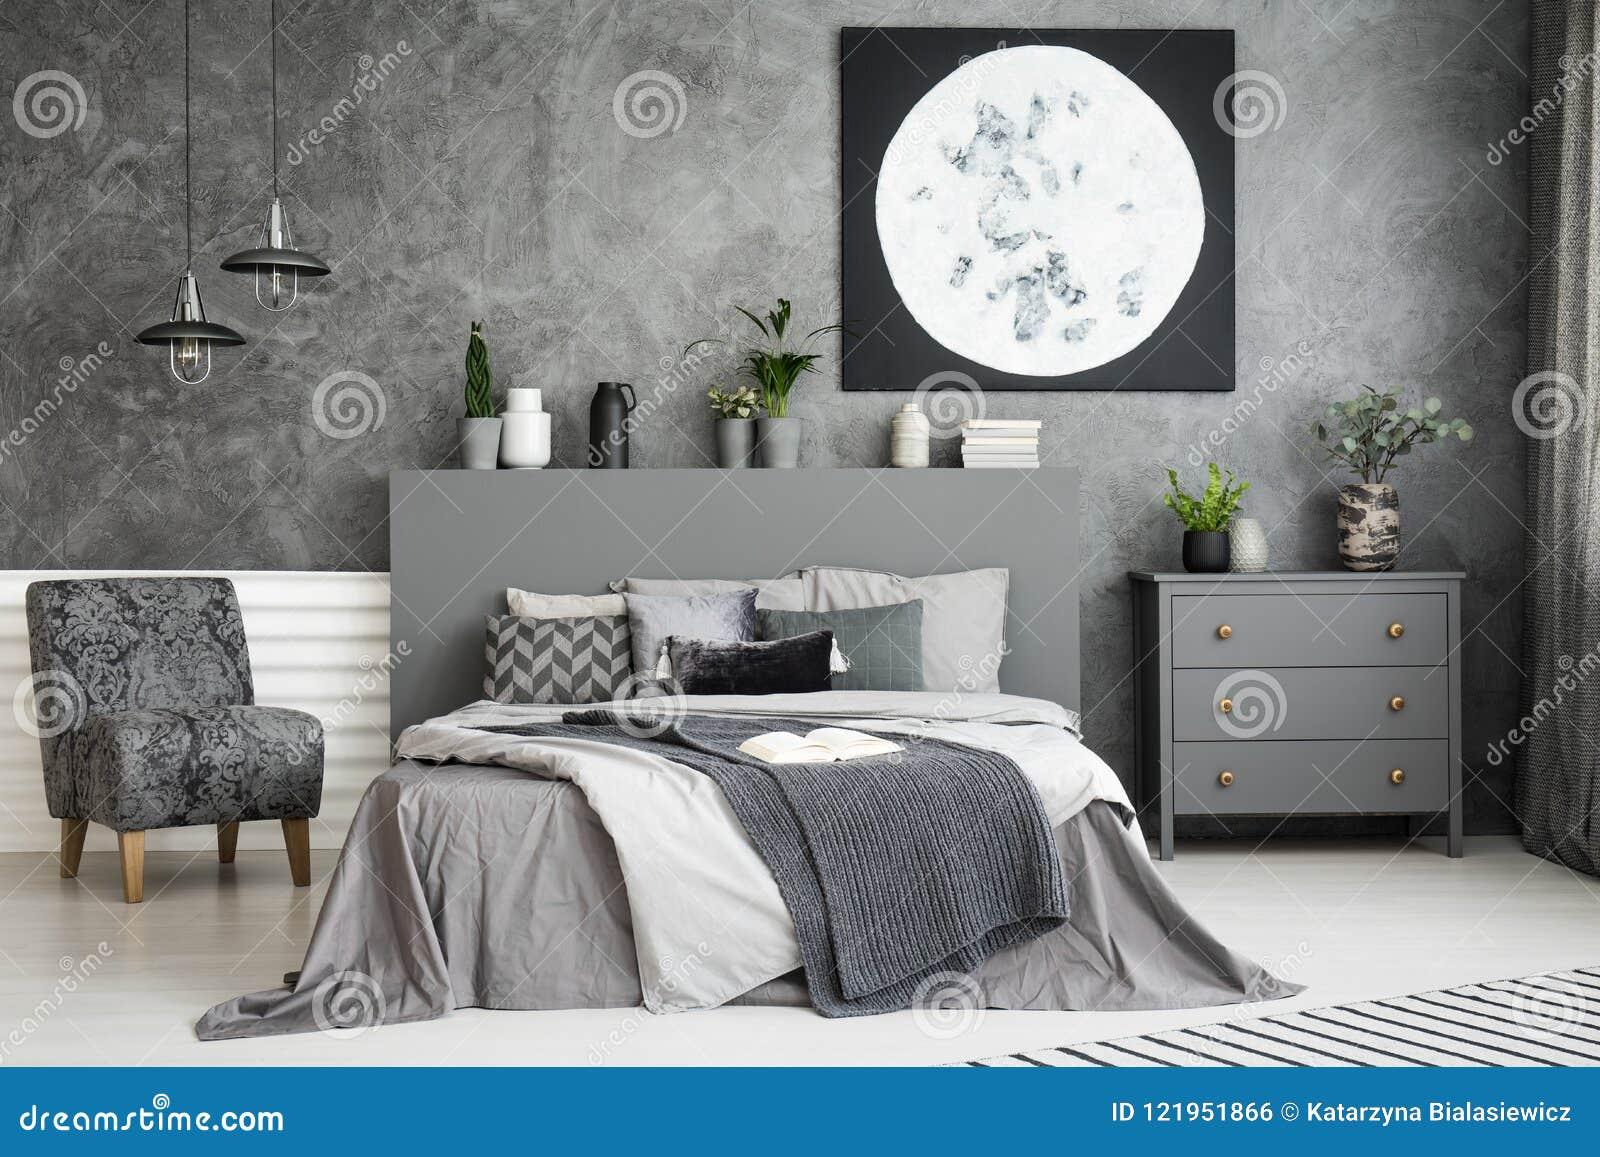 Moon Art Decor On The Wall In A Stylish Grey Bedroom ...